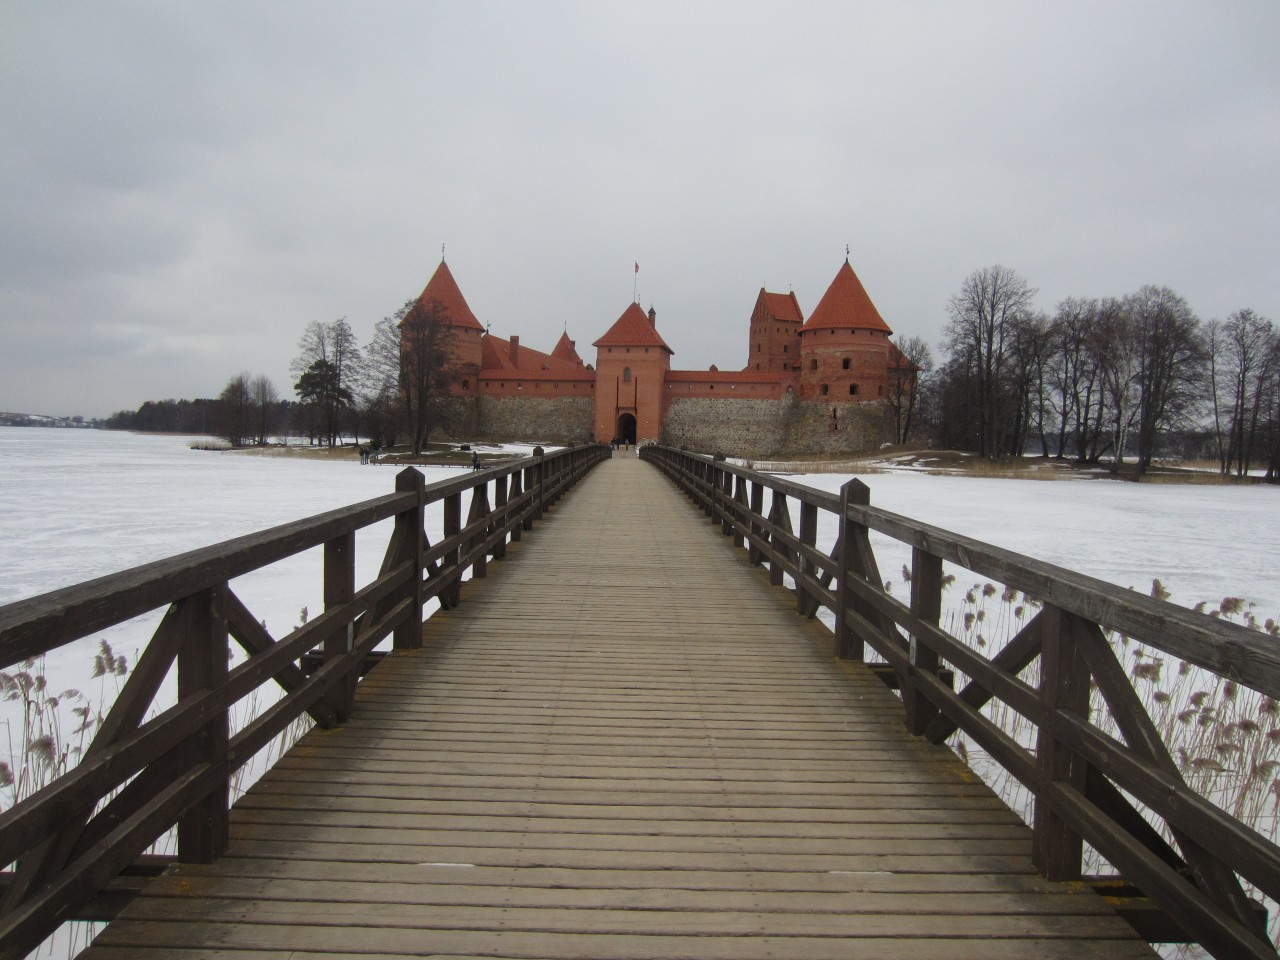 Lithuania's number one –Trakai